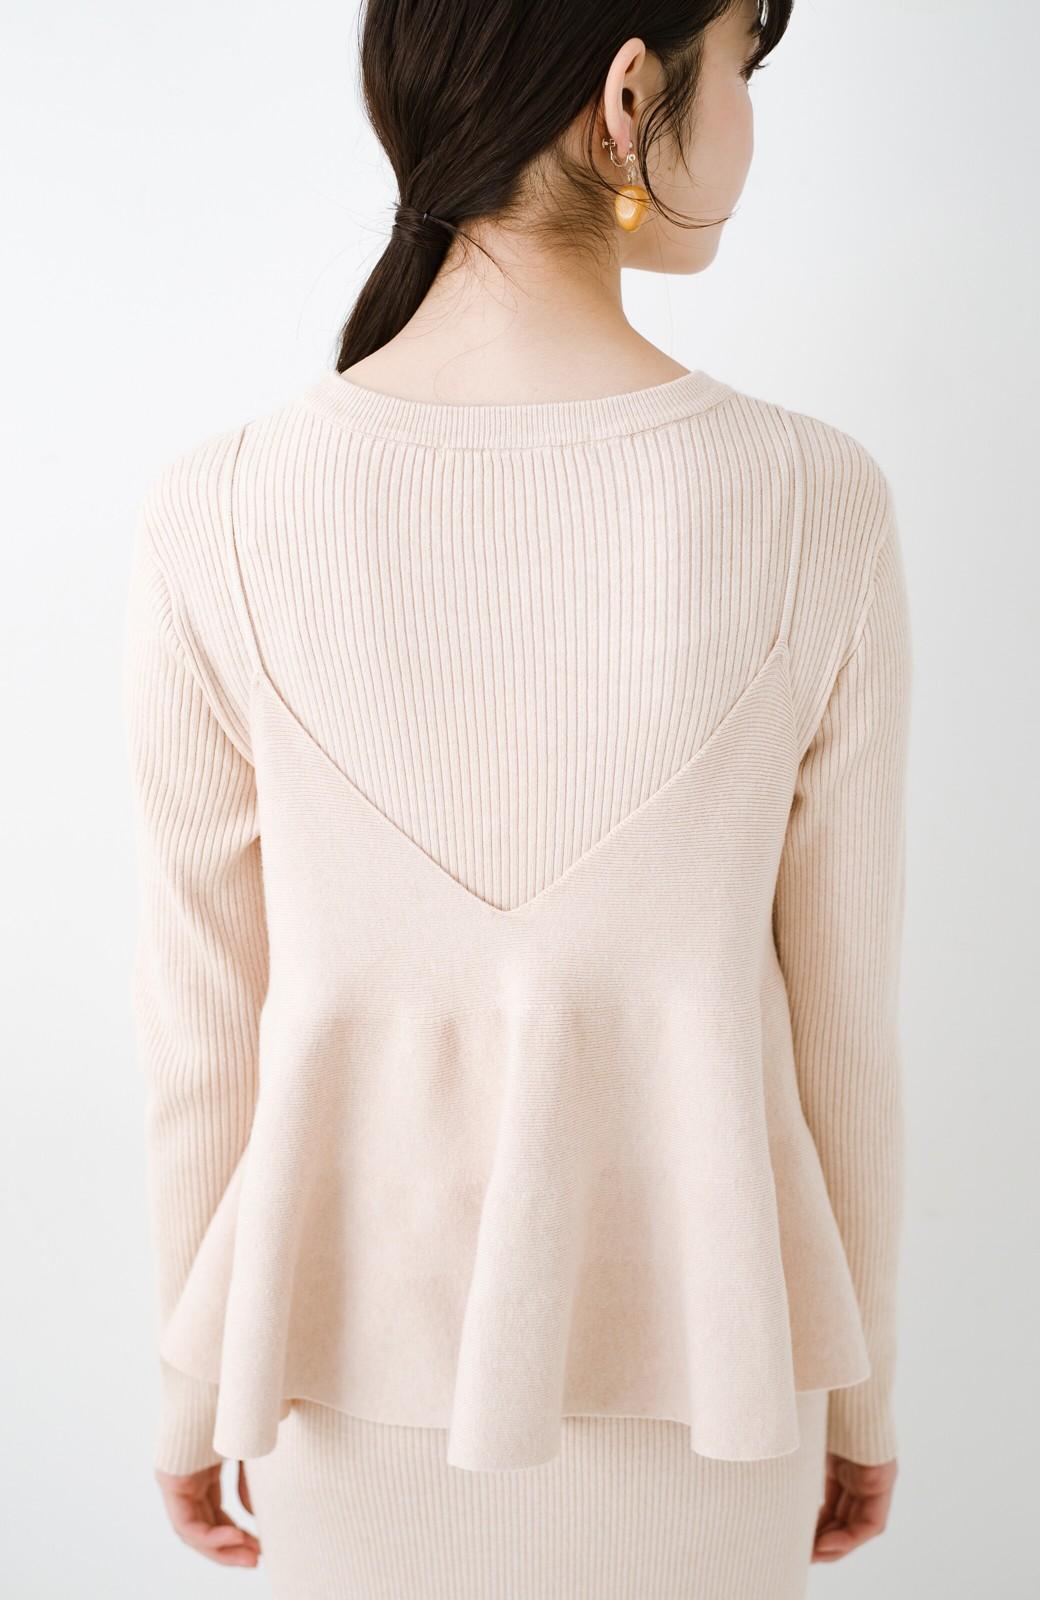 haco! ニットワンピースとキャミソールを重ねて着るだけでパッとオシャレに見えるうれしいセット by style zampa <ライトベージュ>の商品写真7